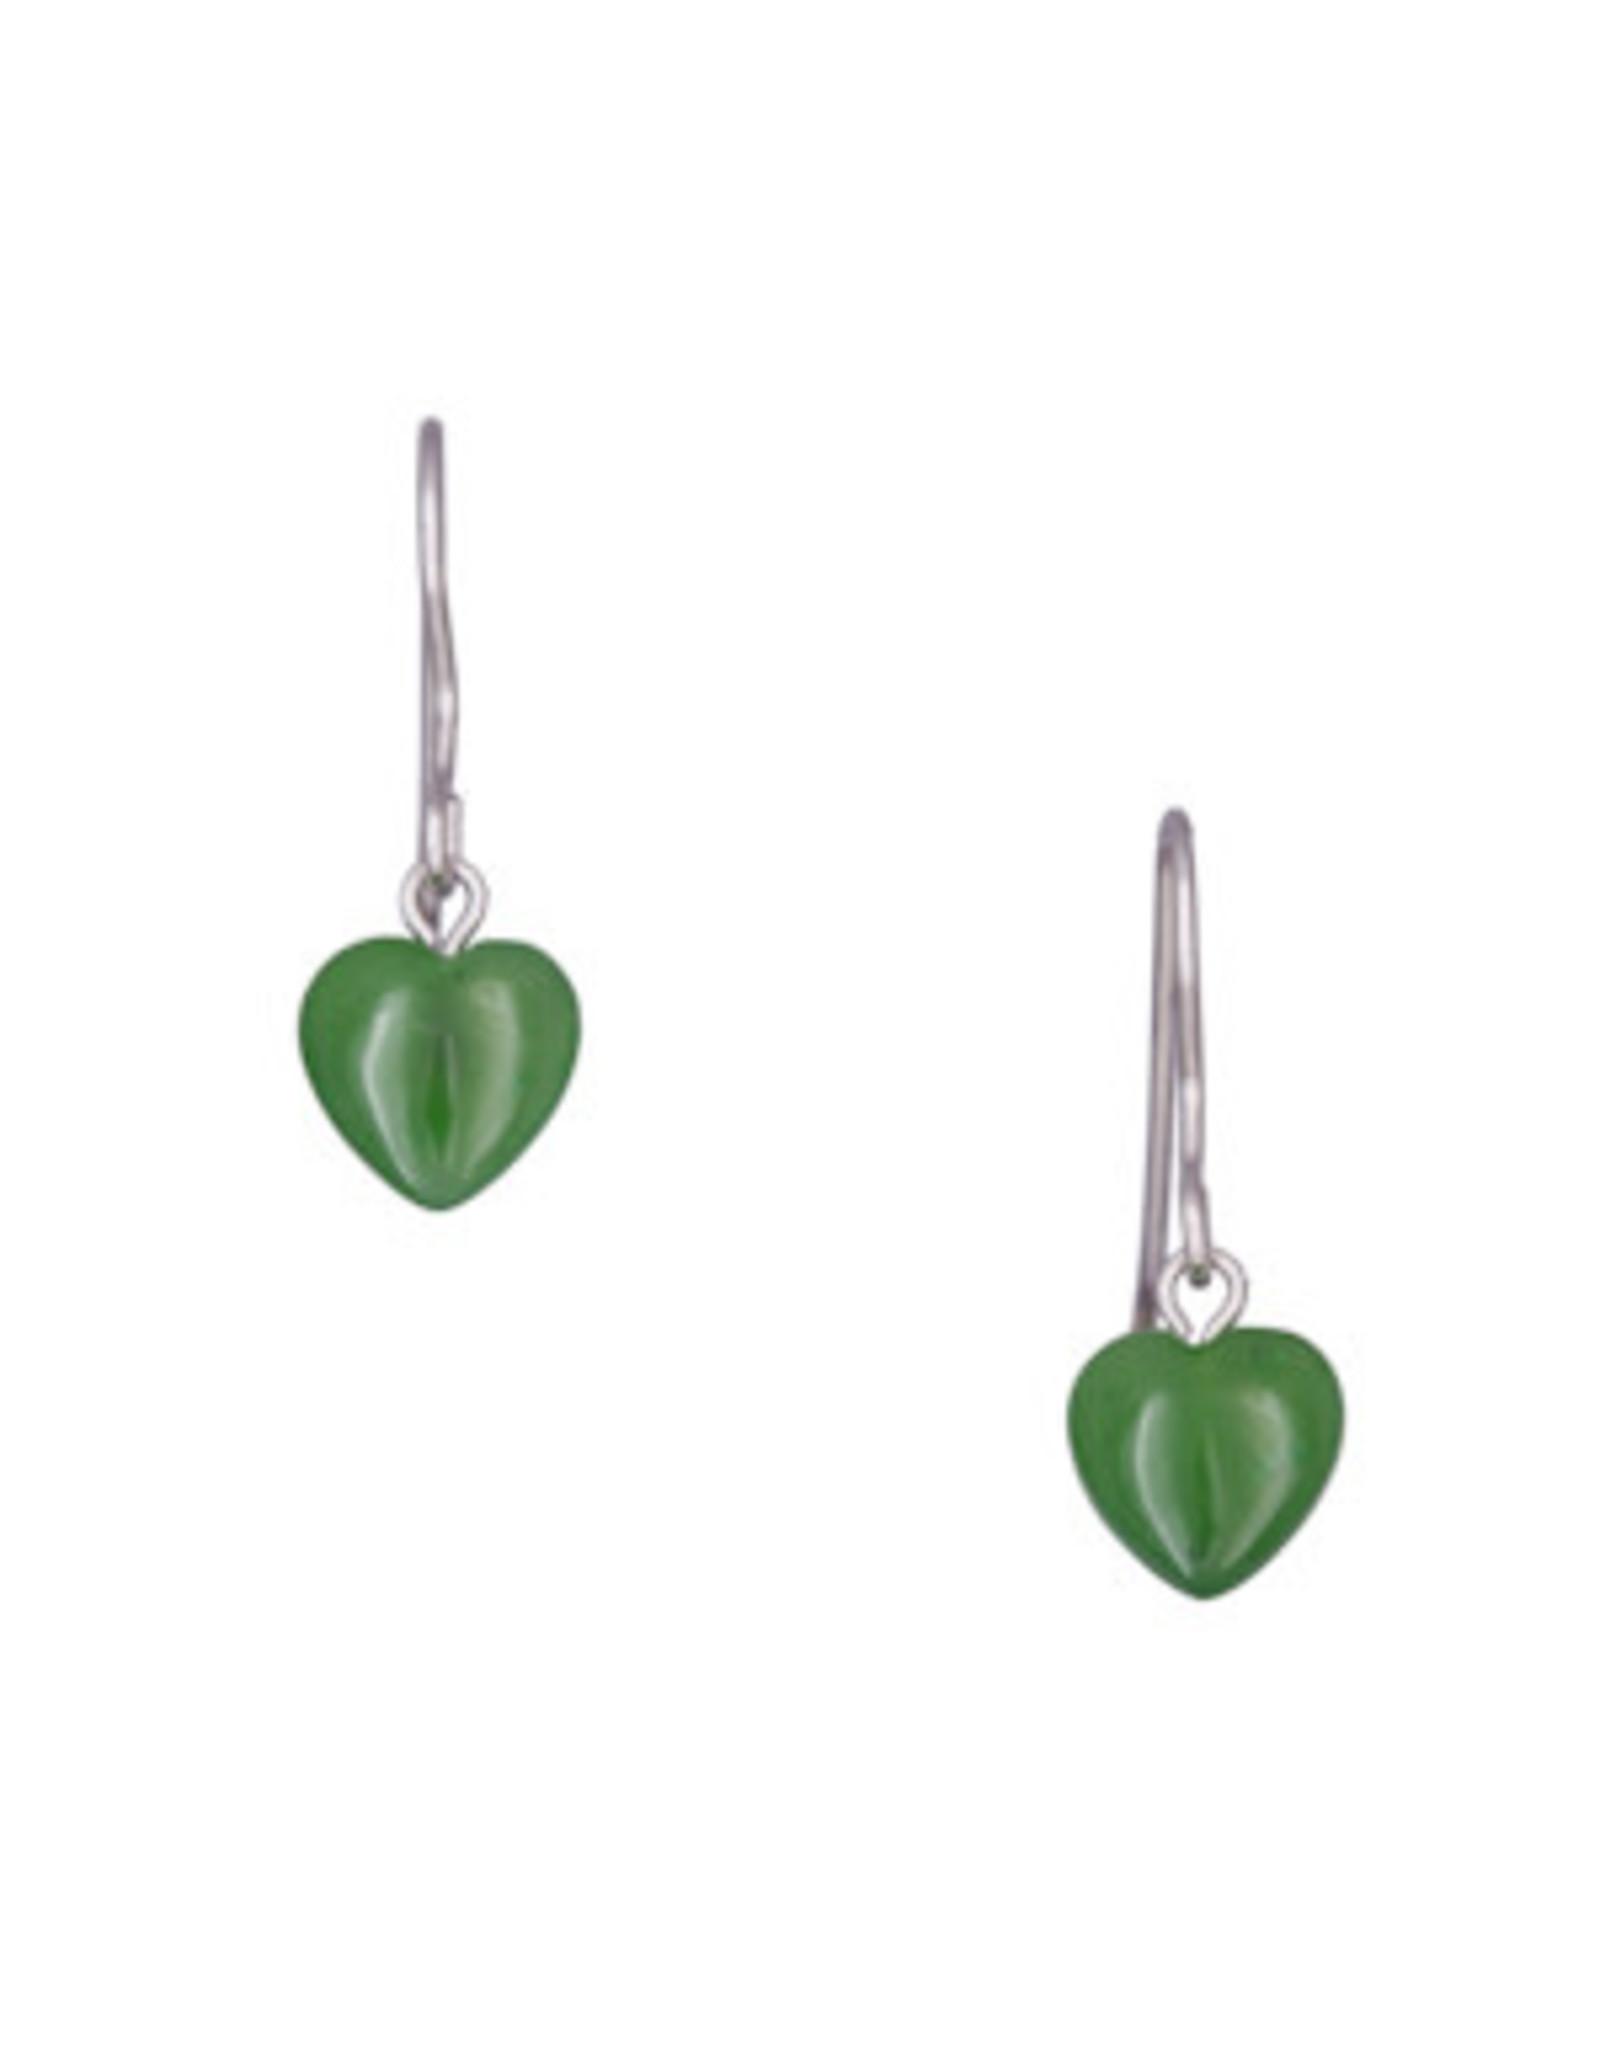 Boucle D'oreille en Jade (Coeur) - JDS66